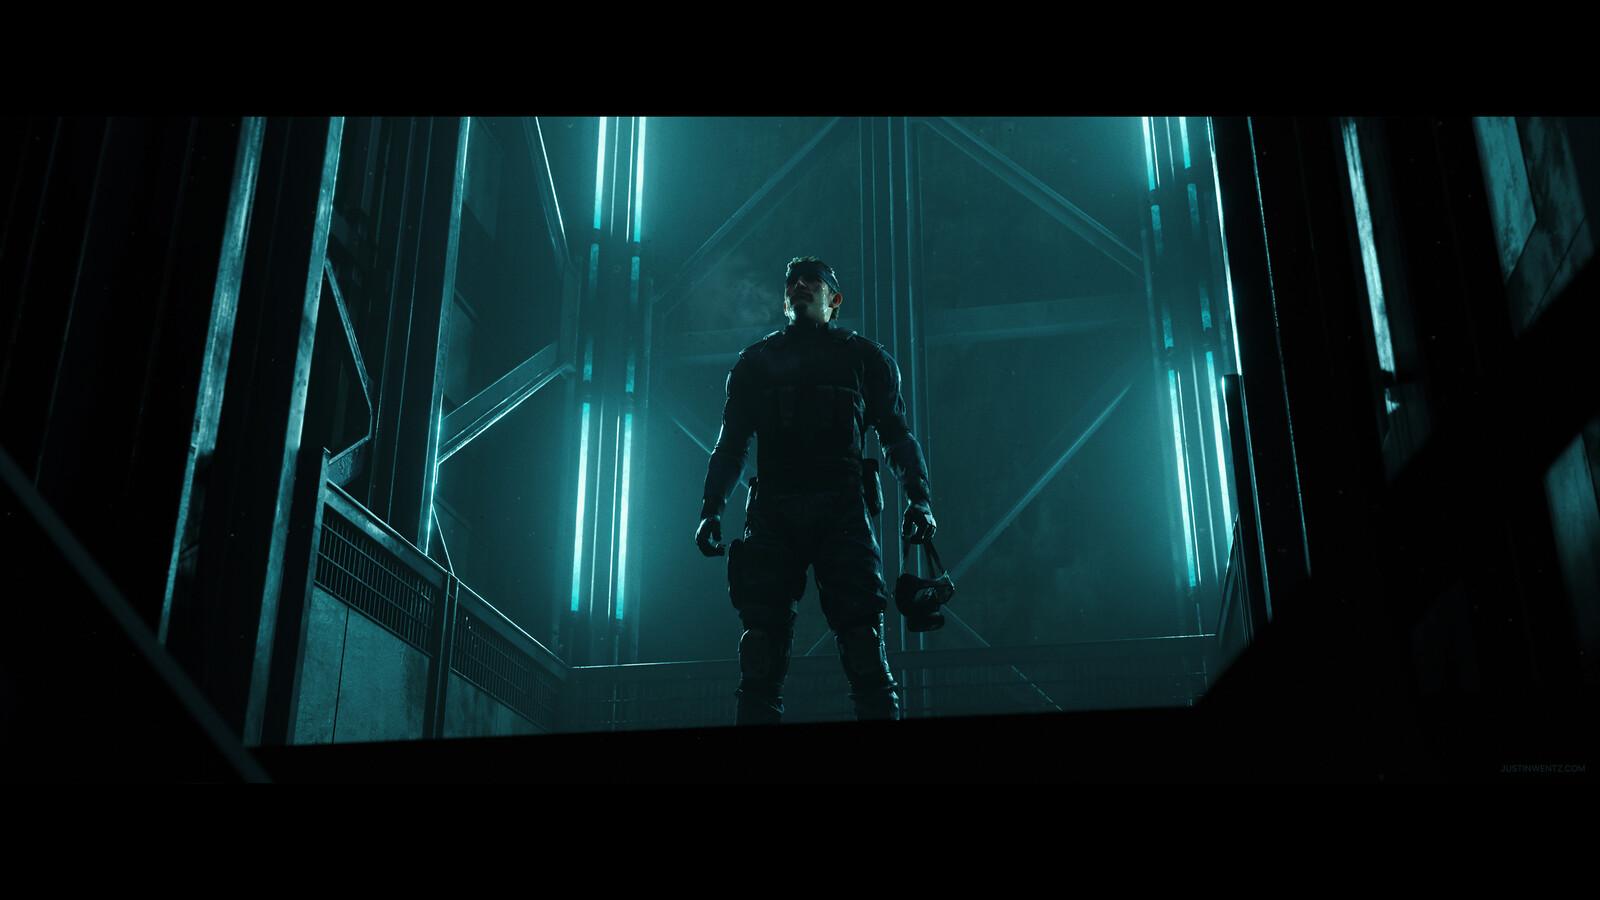 Metal Gear Solid Remake - Fan Concepts